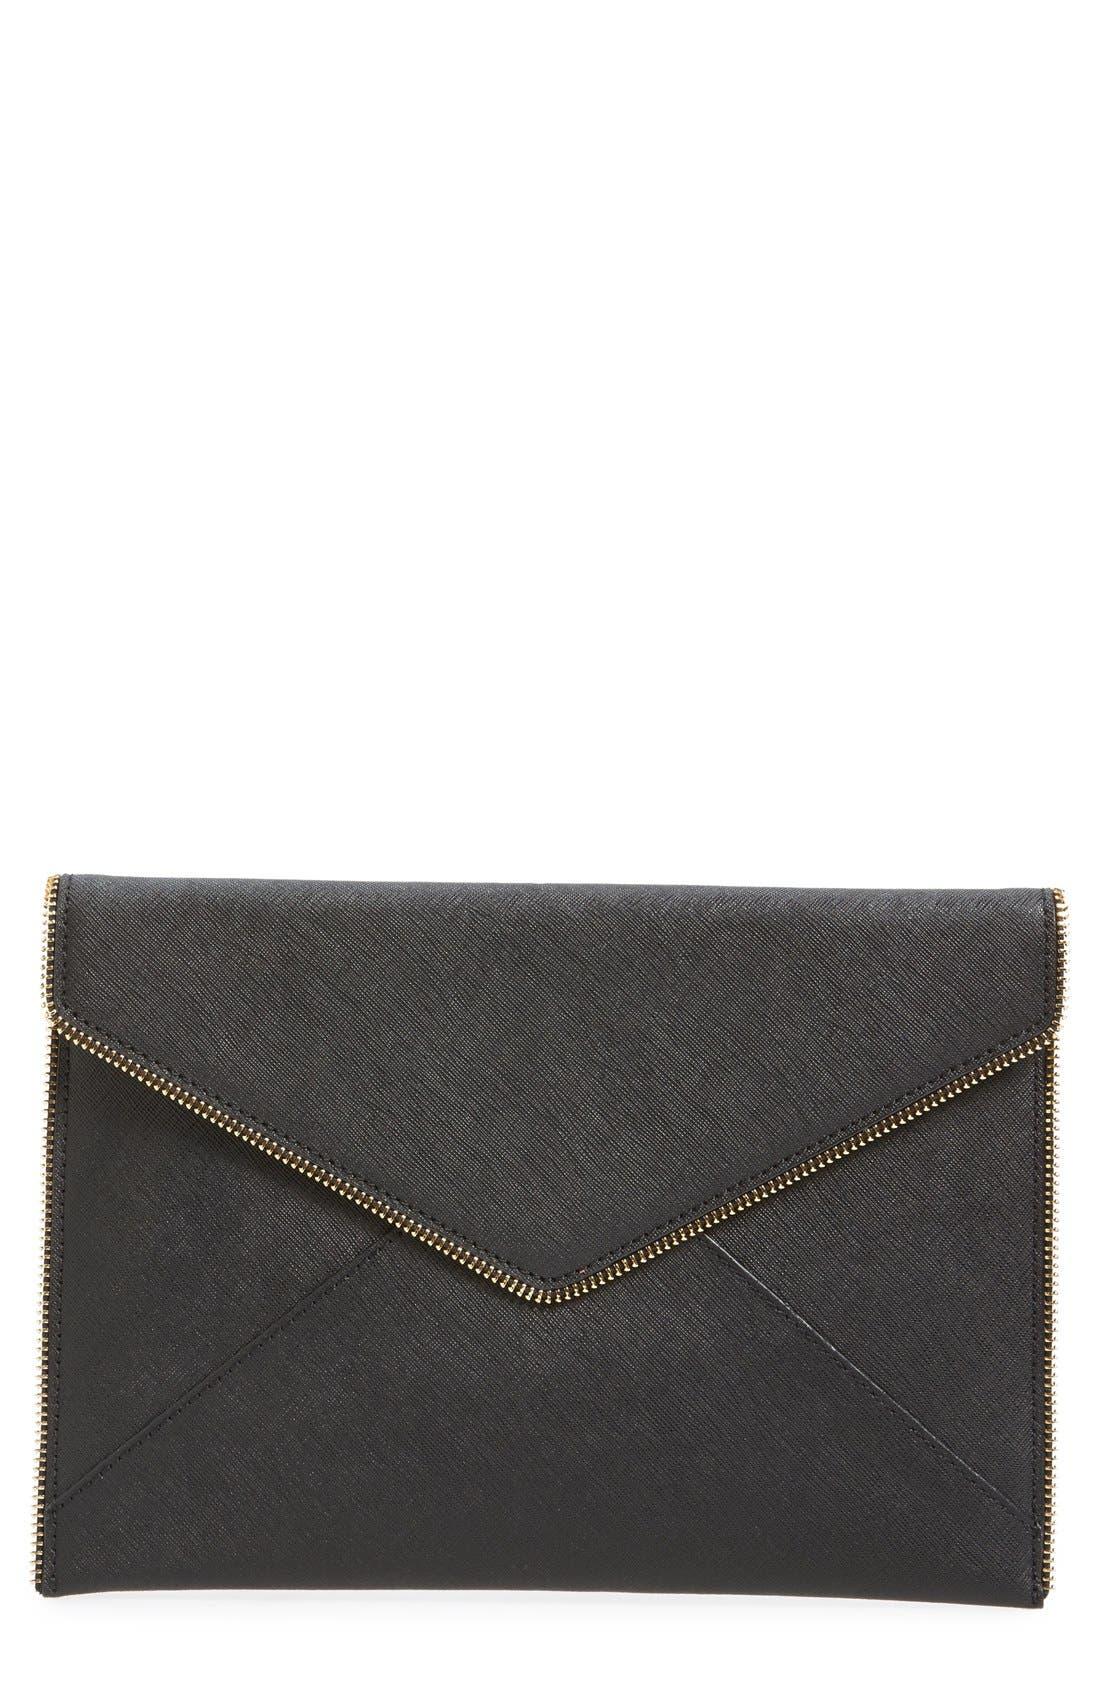 REBECCA MINKOFF Leo Saffiano Clutch Bag, Black